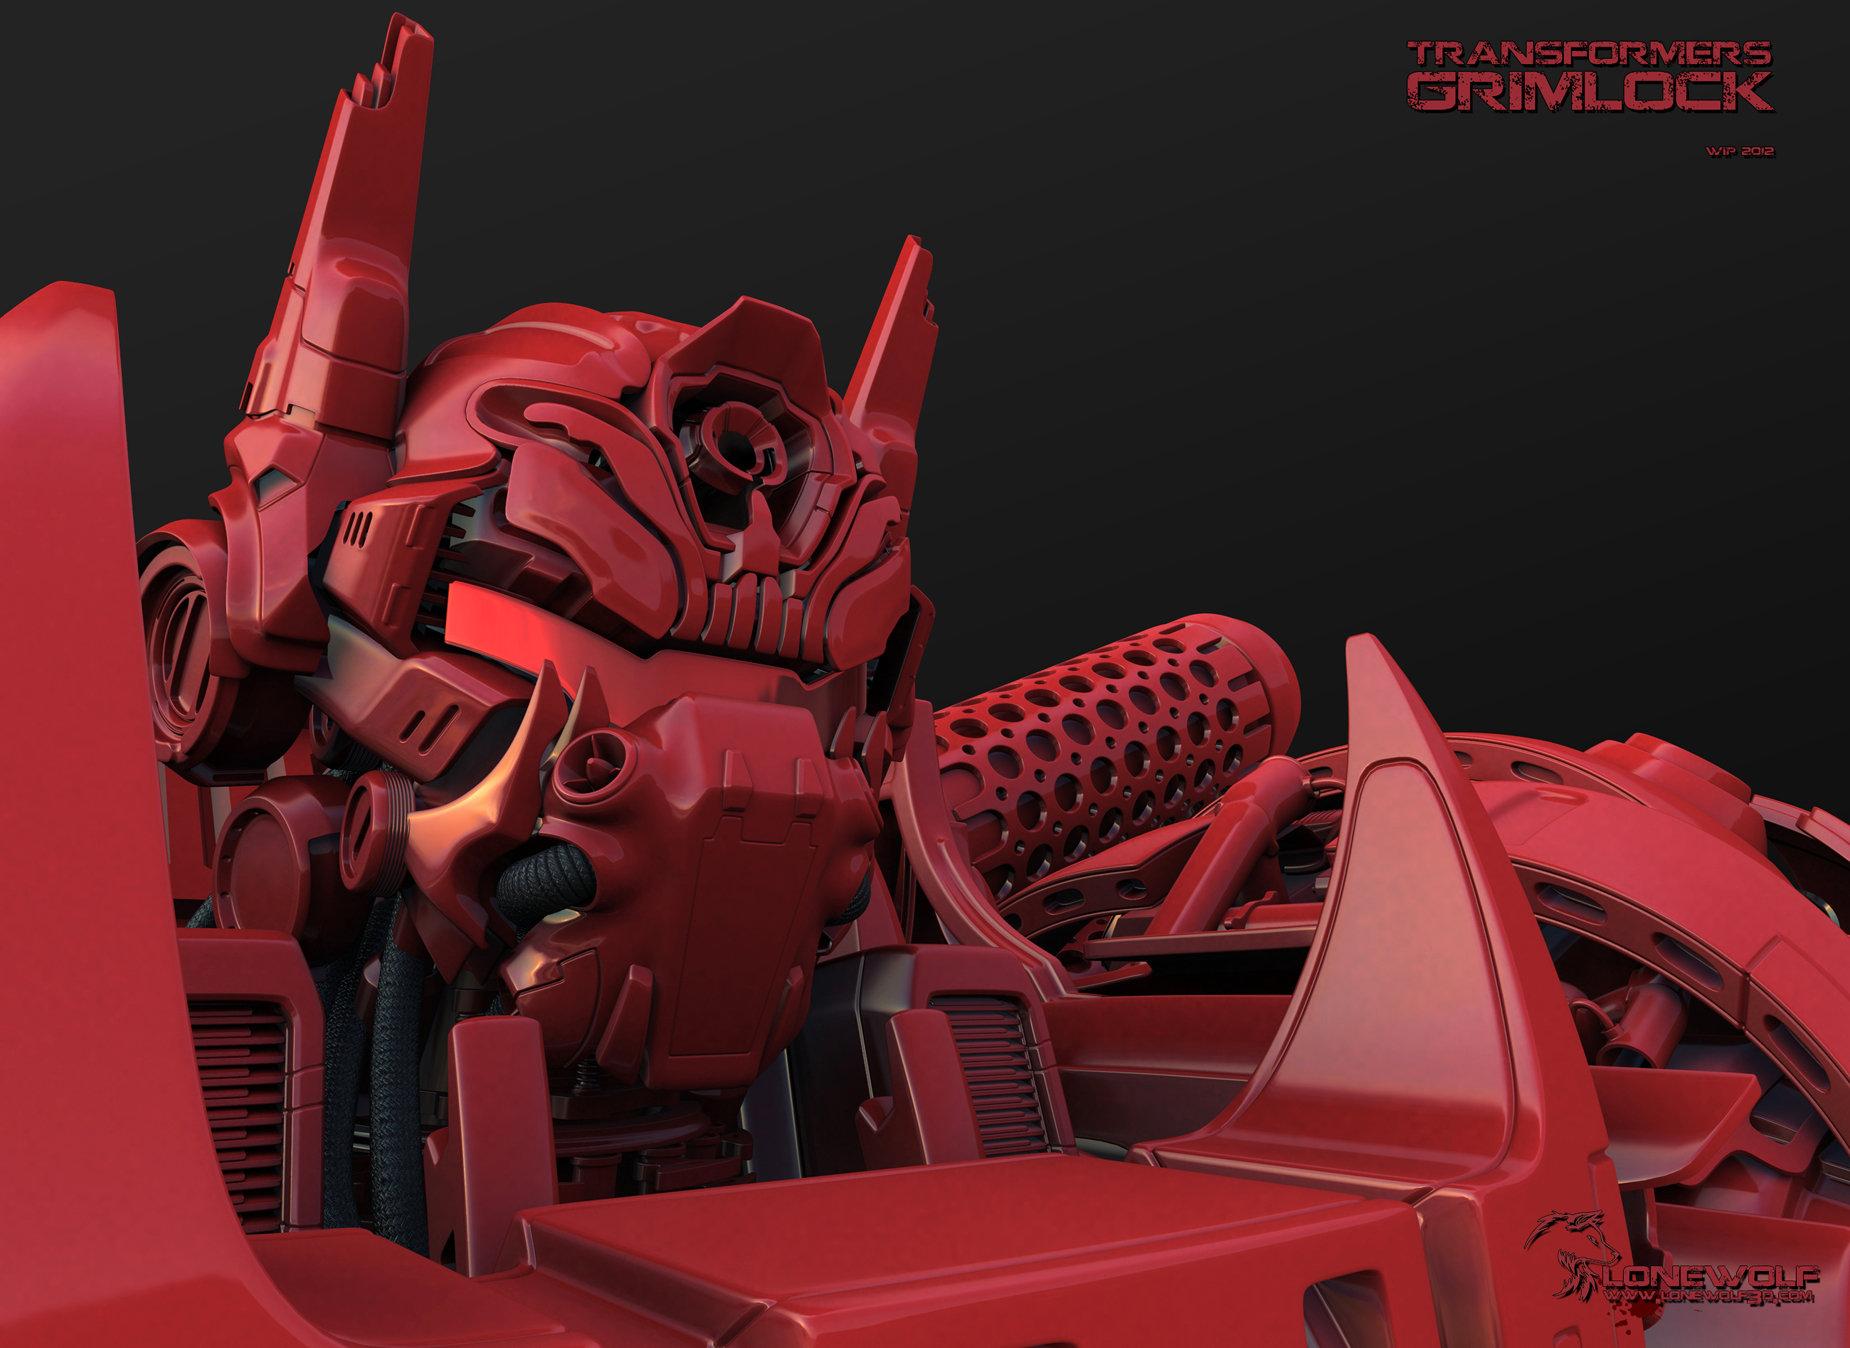 Grimlock transformers tf4 02